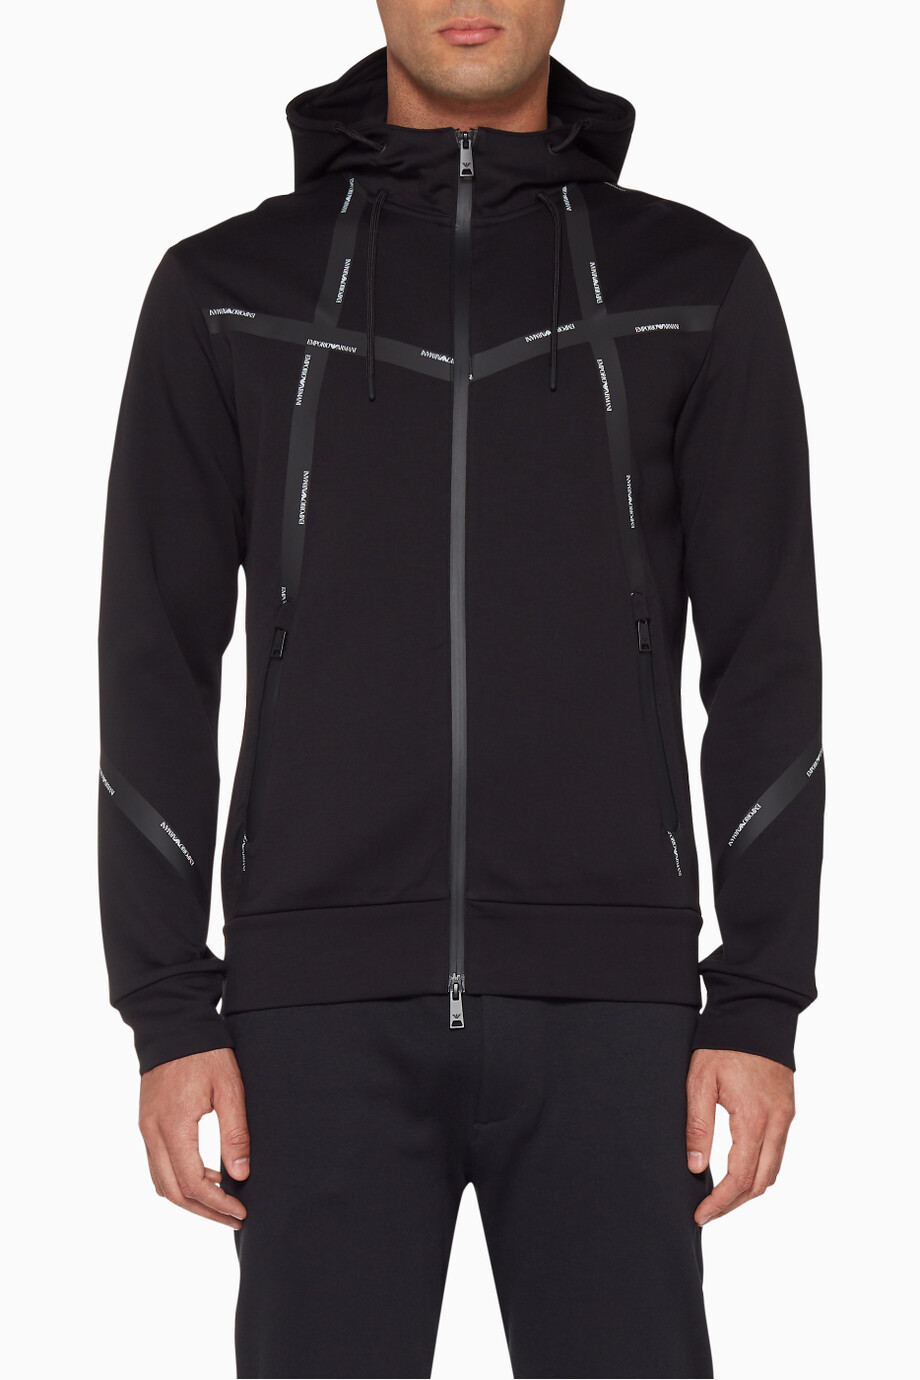 ff855c1220 Shop Emporio Armani Black Black Logo Tape Jacket for Men | Ounass Kuwait